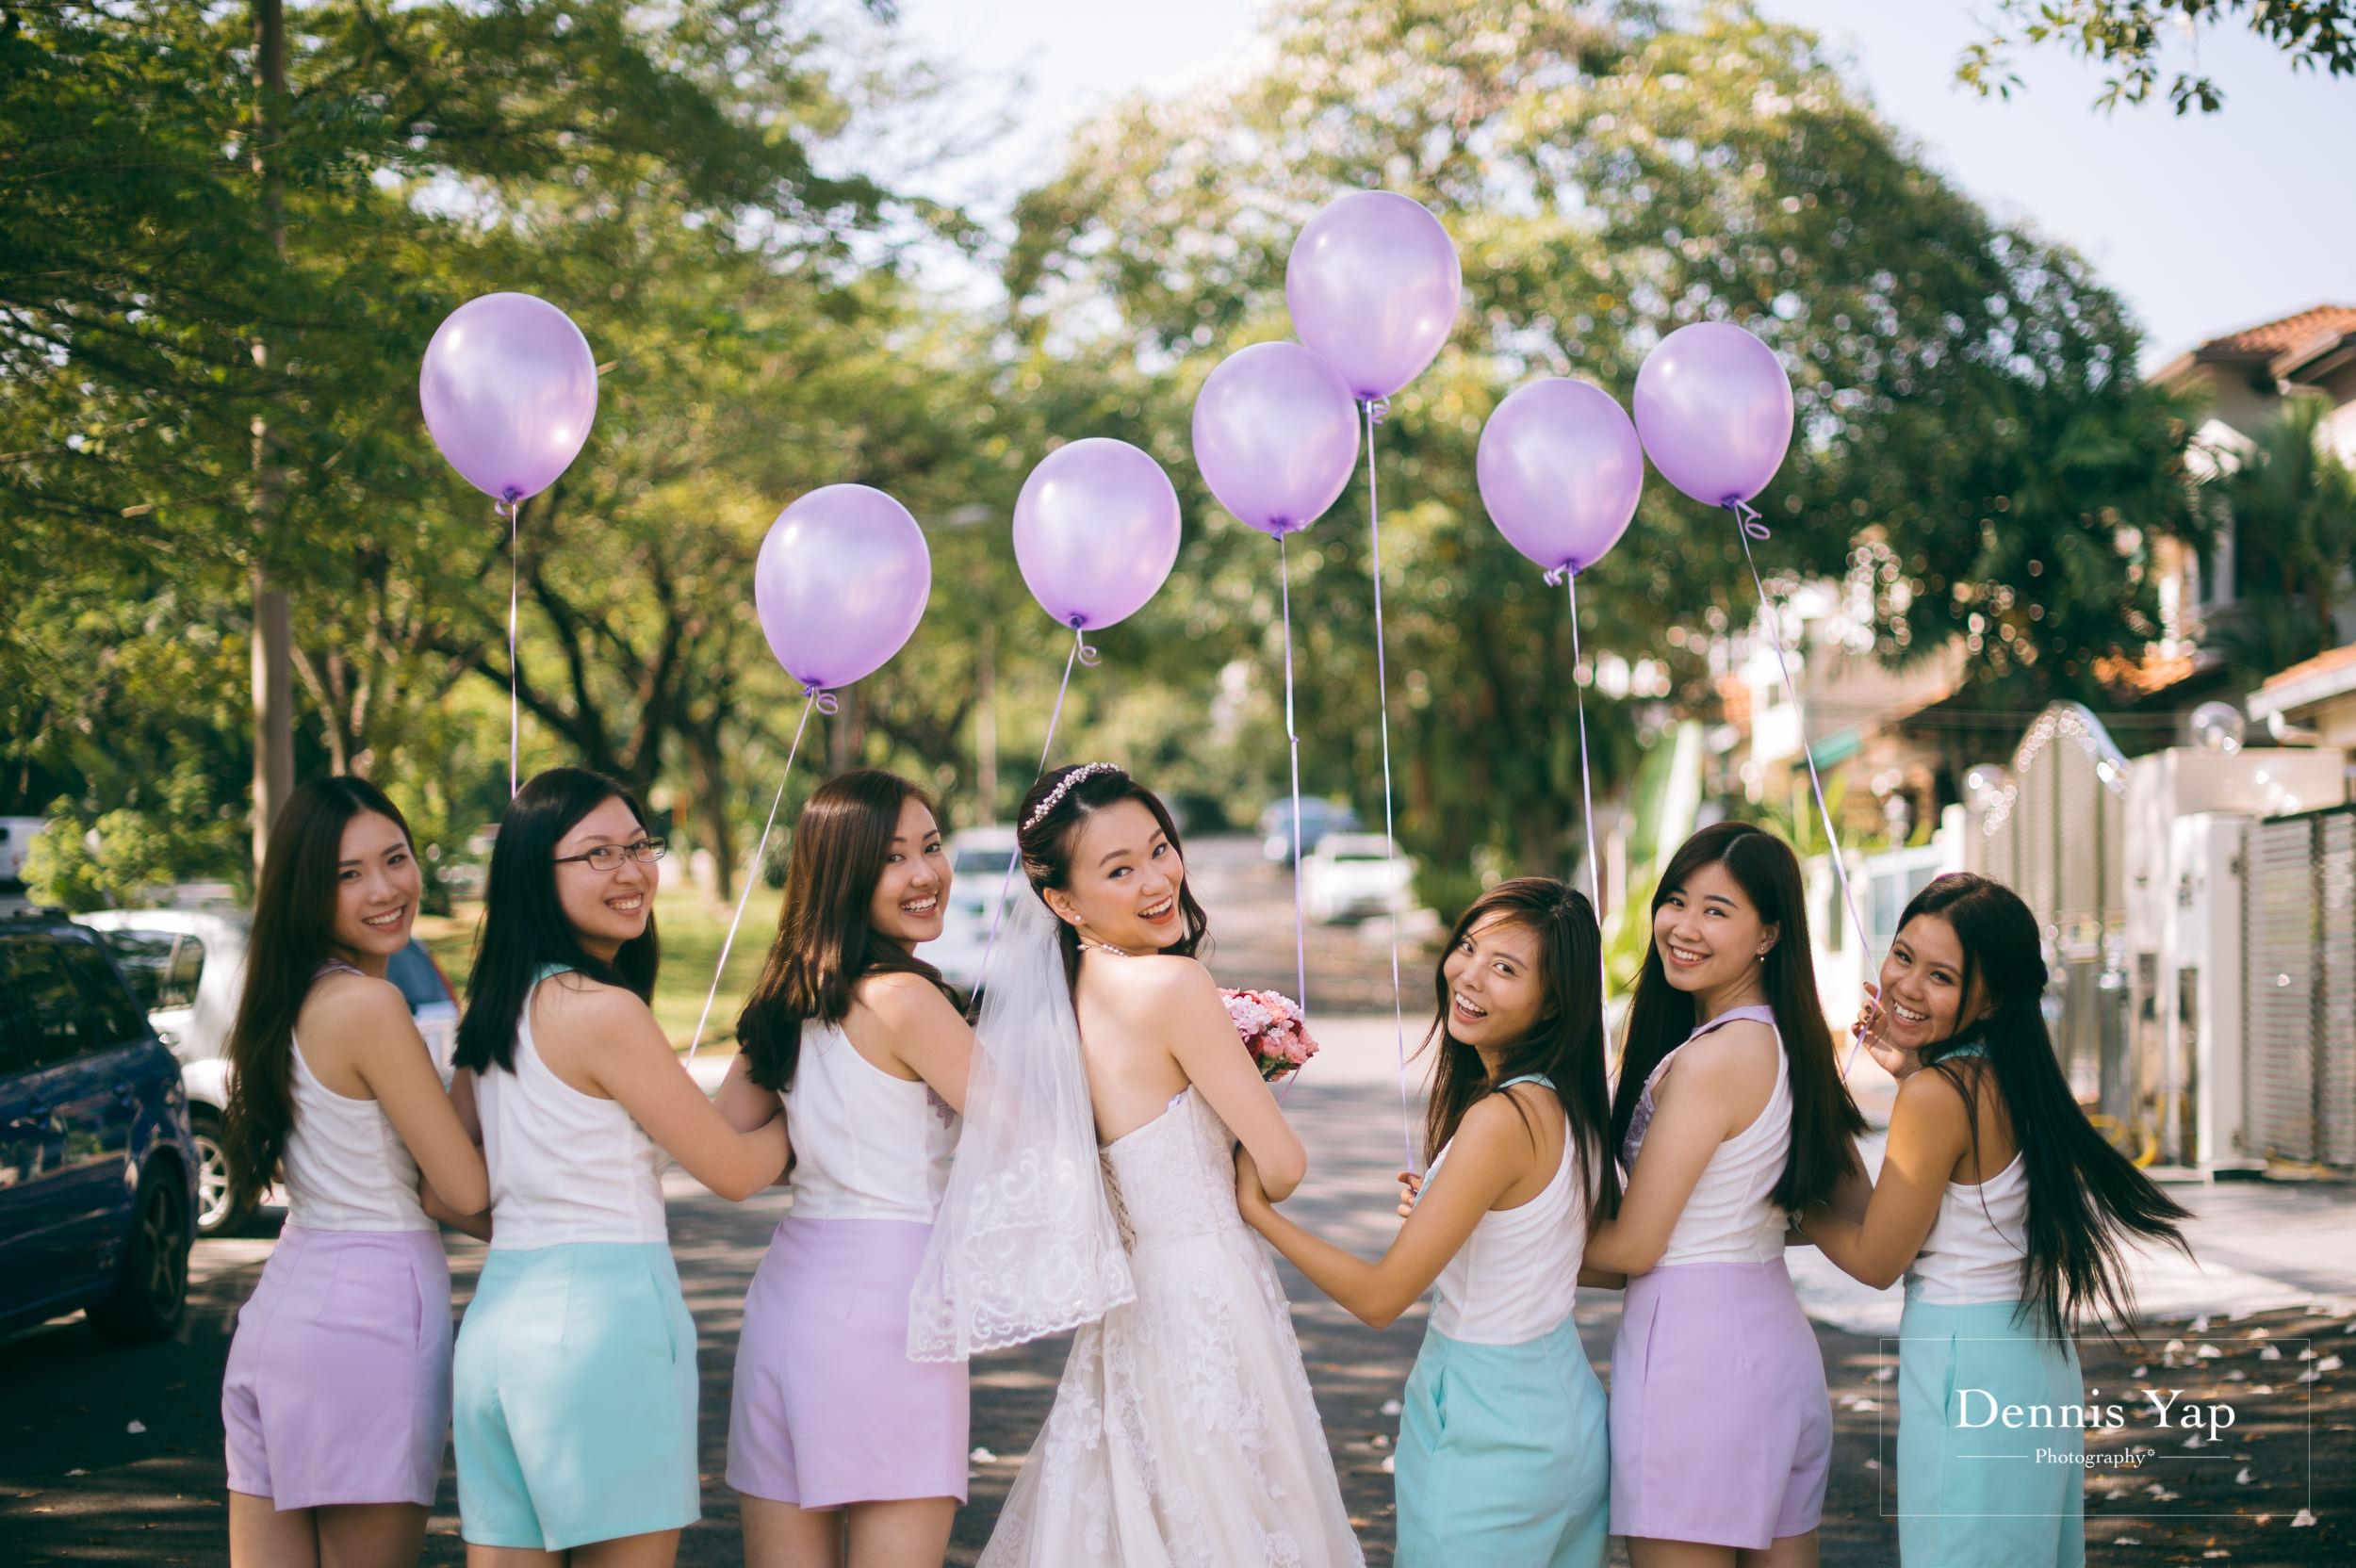 ethan juli wedding day gate crash wedding party dennis yap photography colors-35.jpg